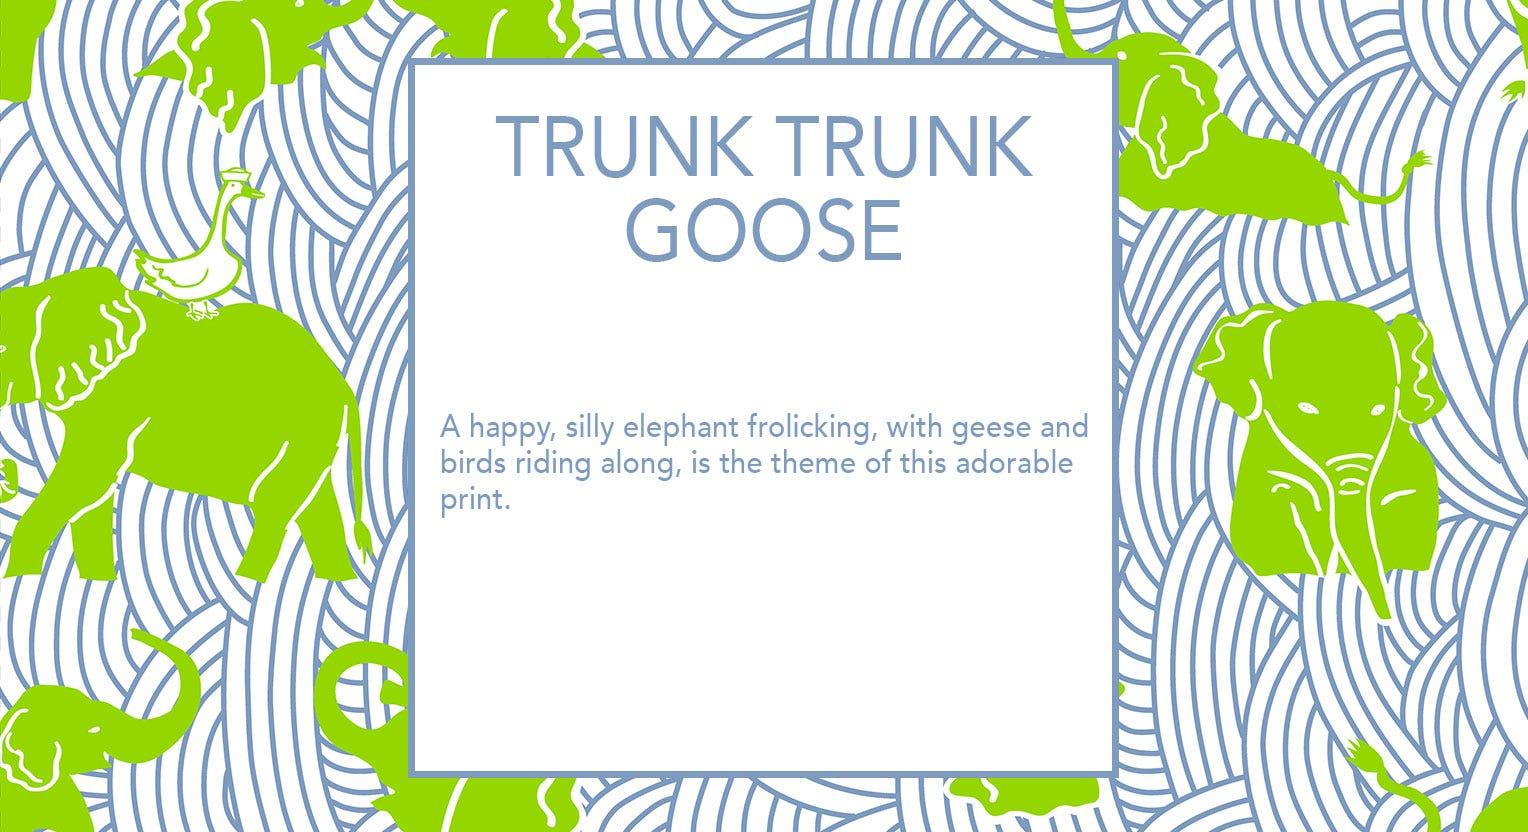 Trunk Trunk Goose